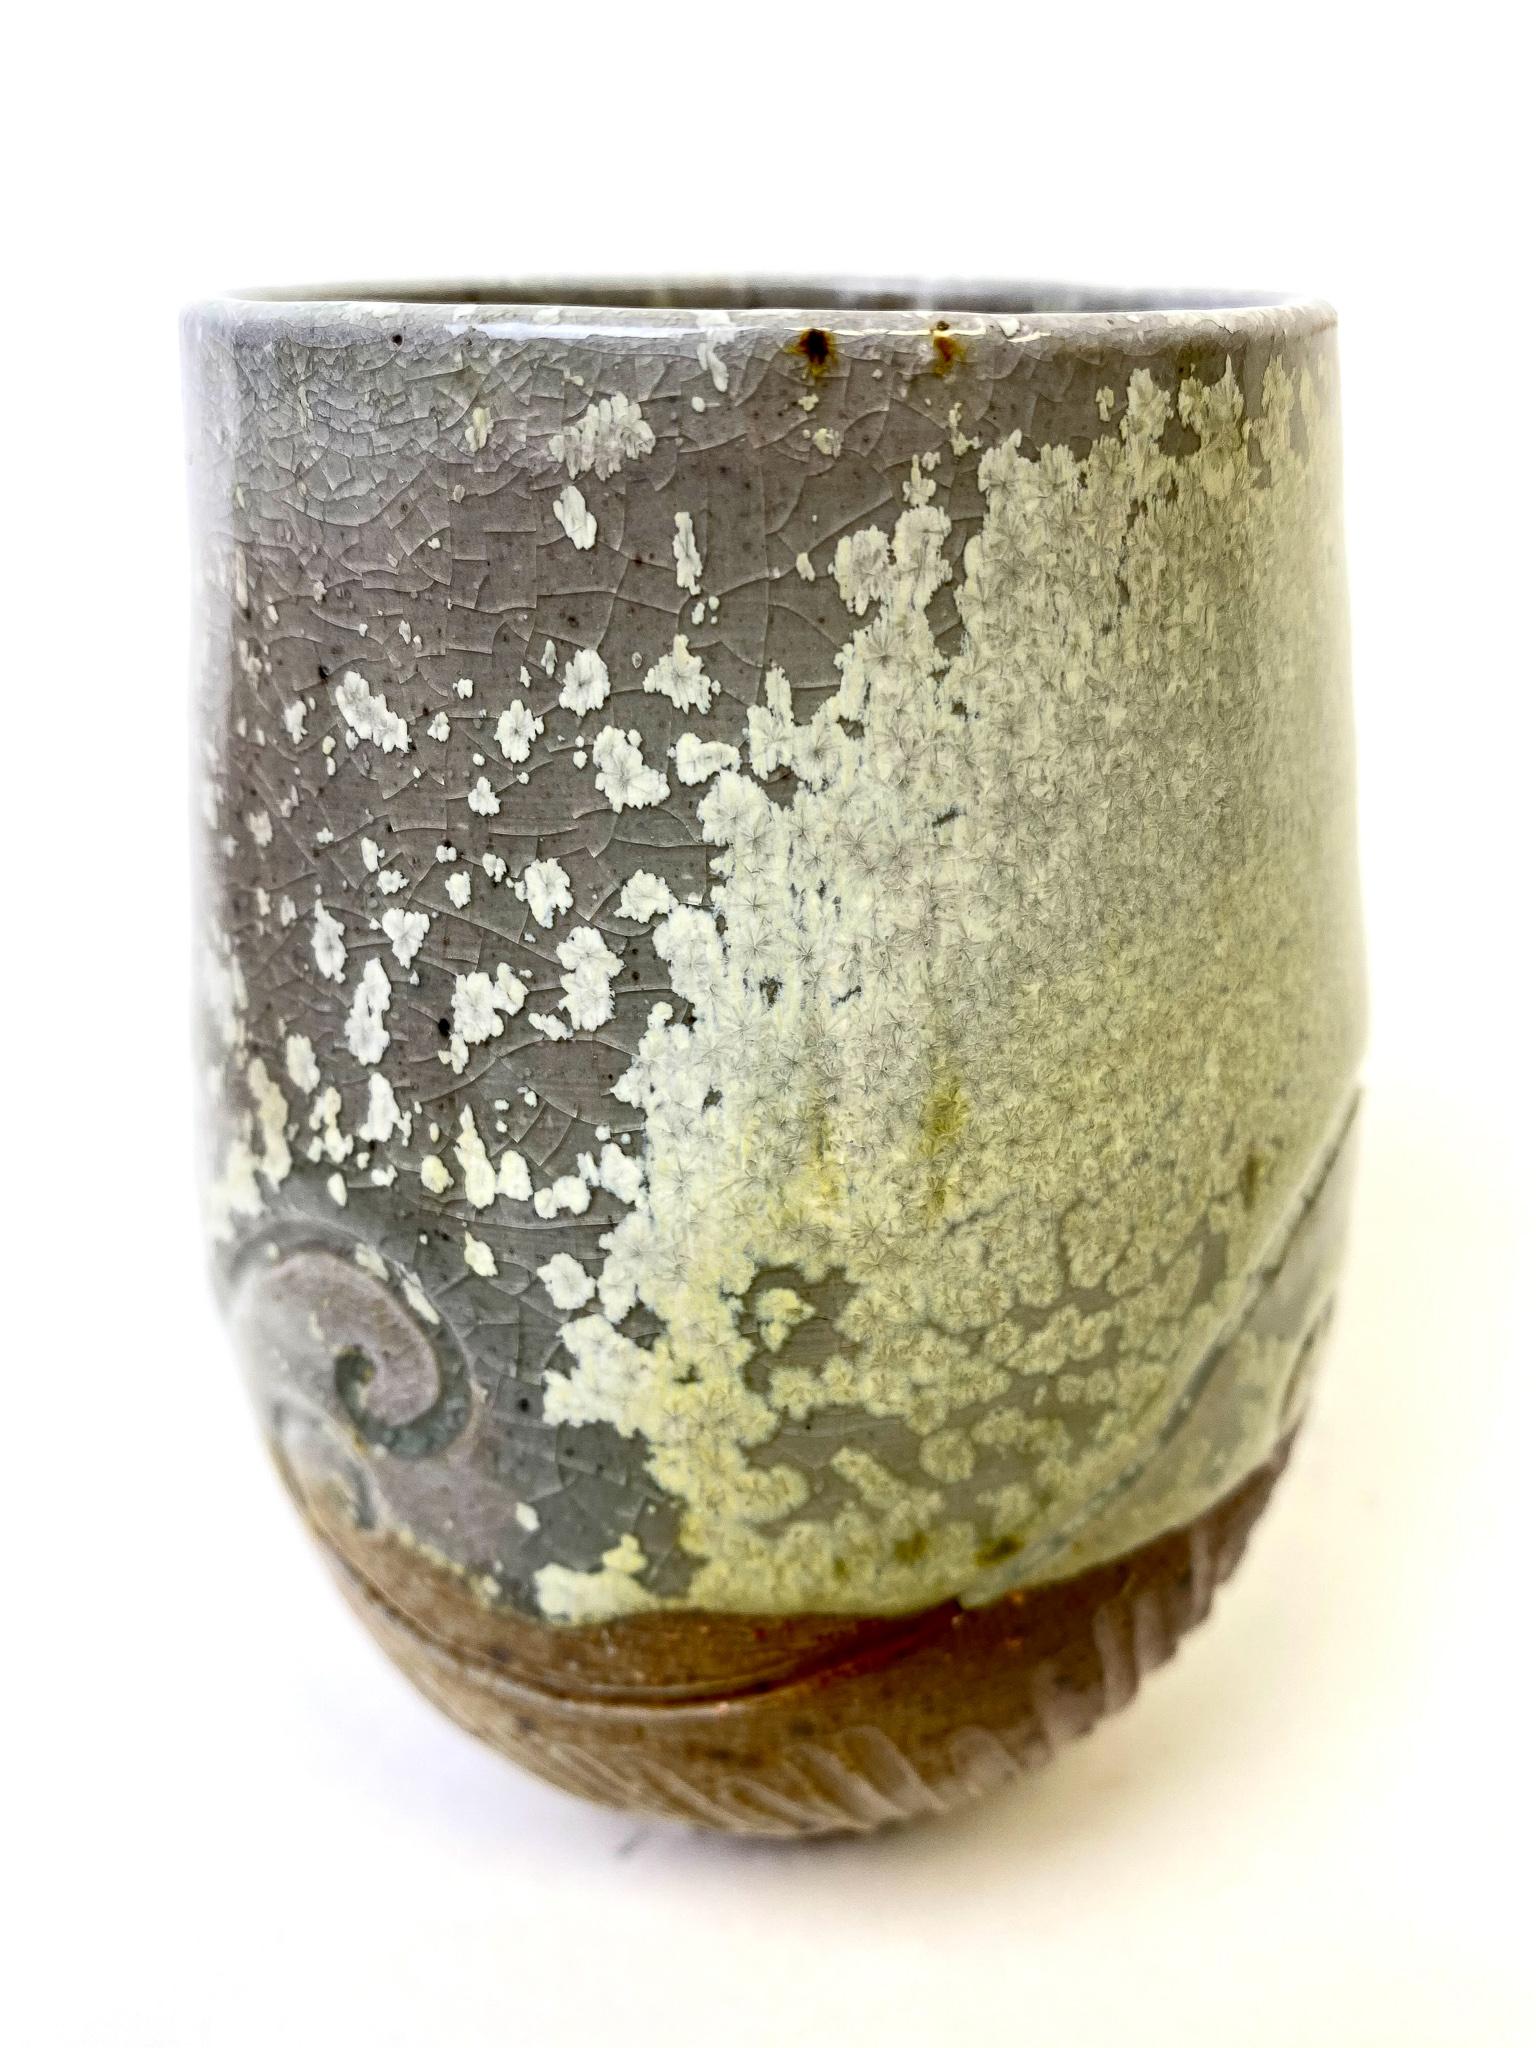 Wood/Salt Tumbler with VC Matte Glaze